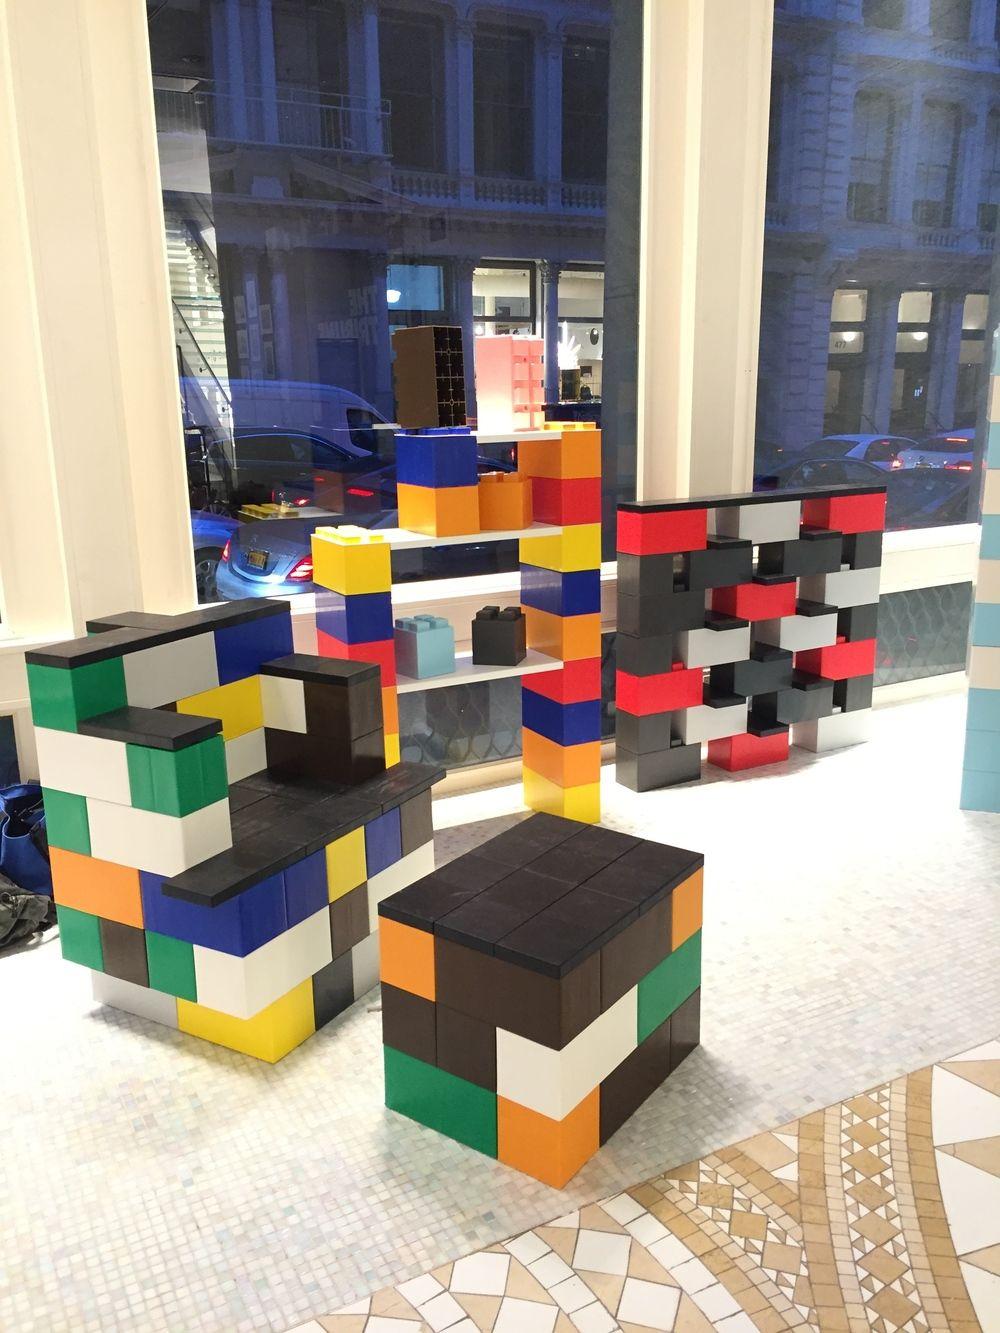 Large Lego Modular Building Blocks From Www Modularbuildingblocks Co